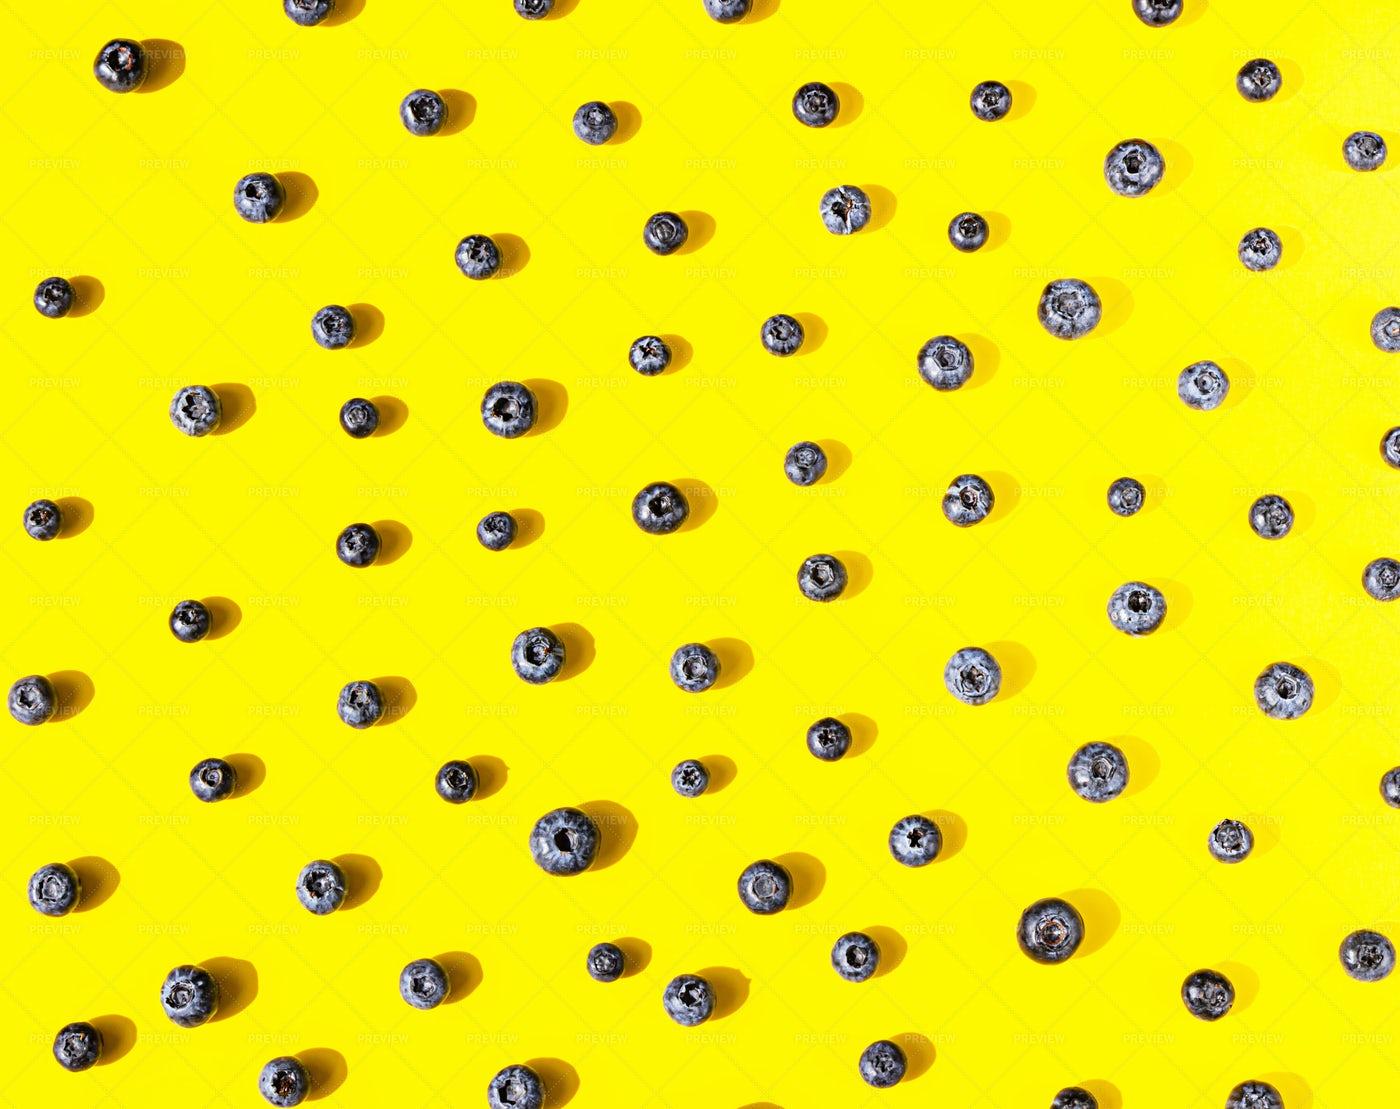 Blueberries Pattern On Yellow: Stock Photos